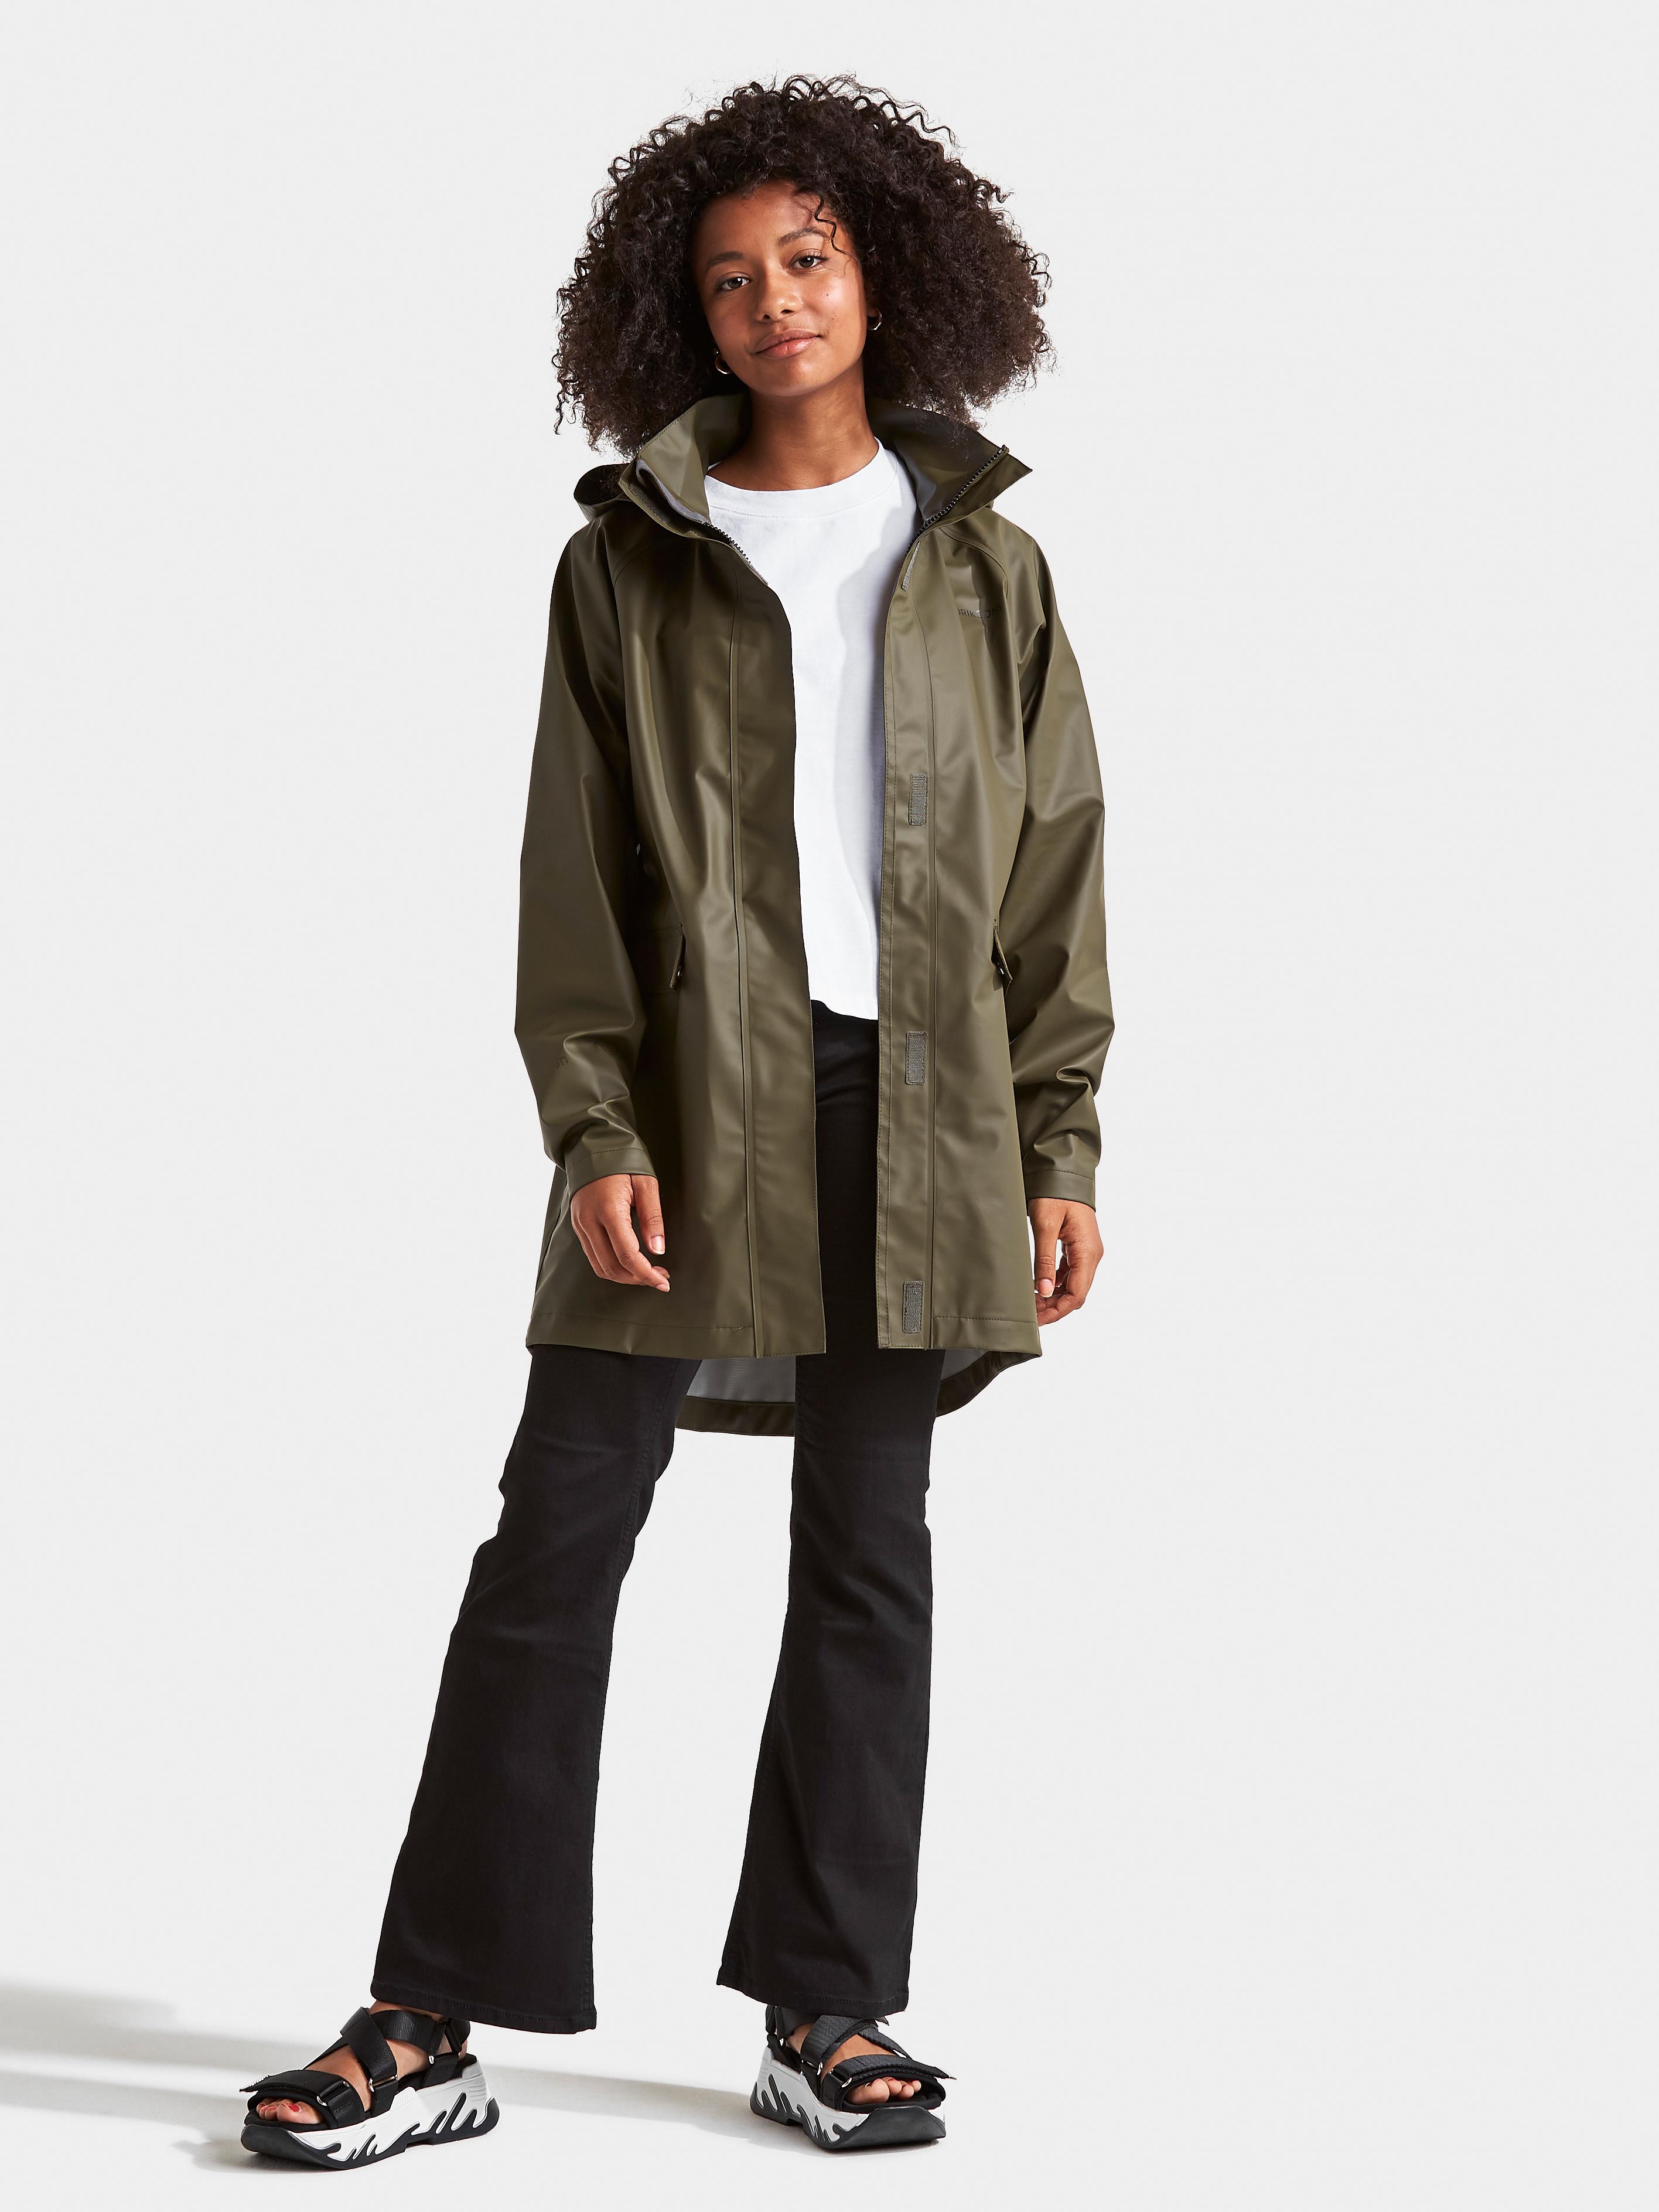 Didriksons chica lluvia chaqueta chaqueta Elise GS galon JKT rosa viento densamente monocromo